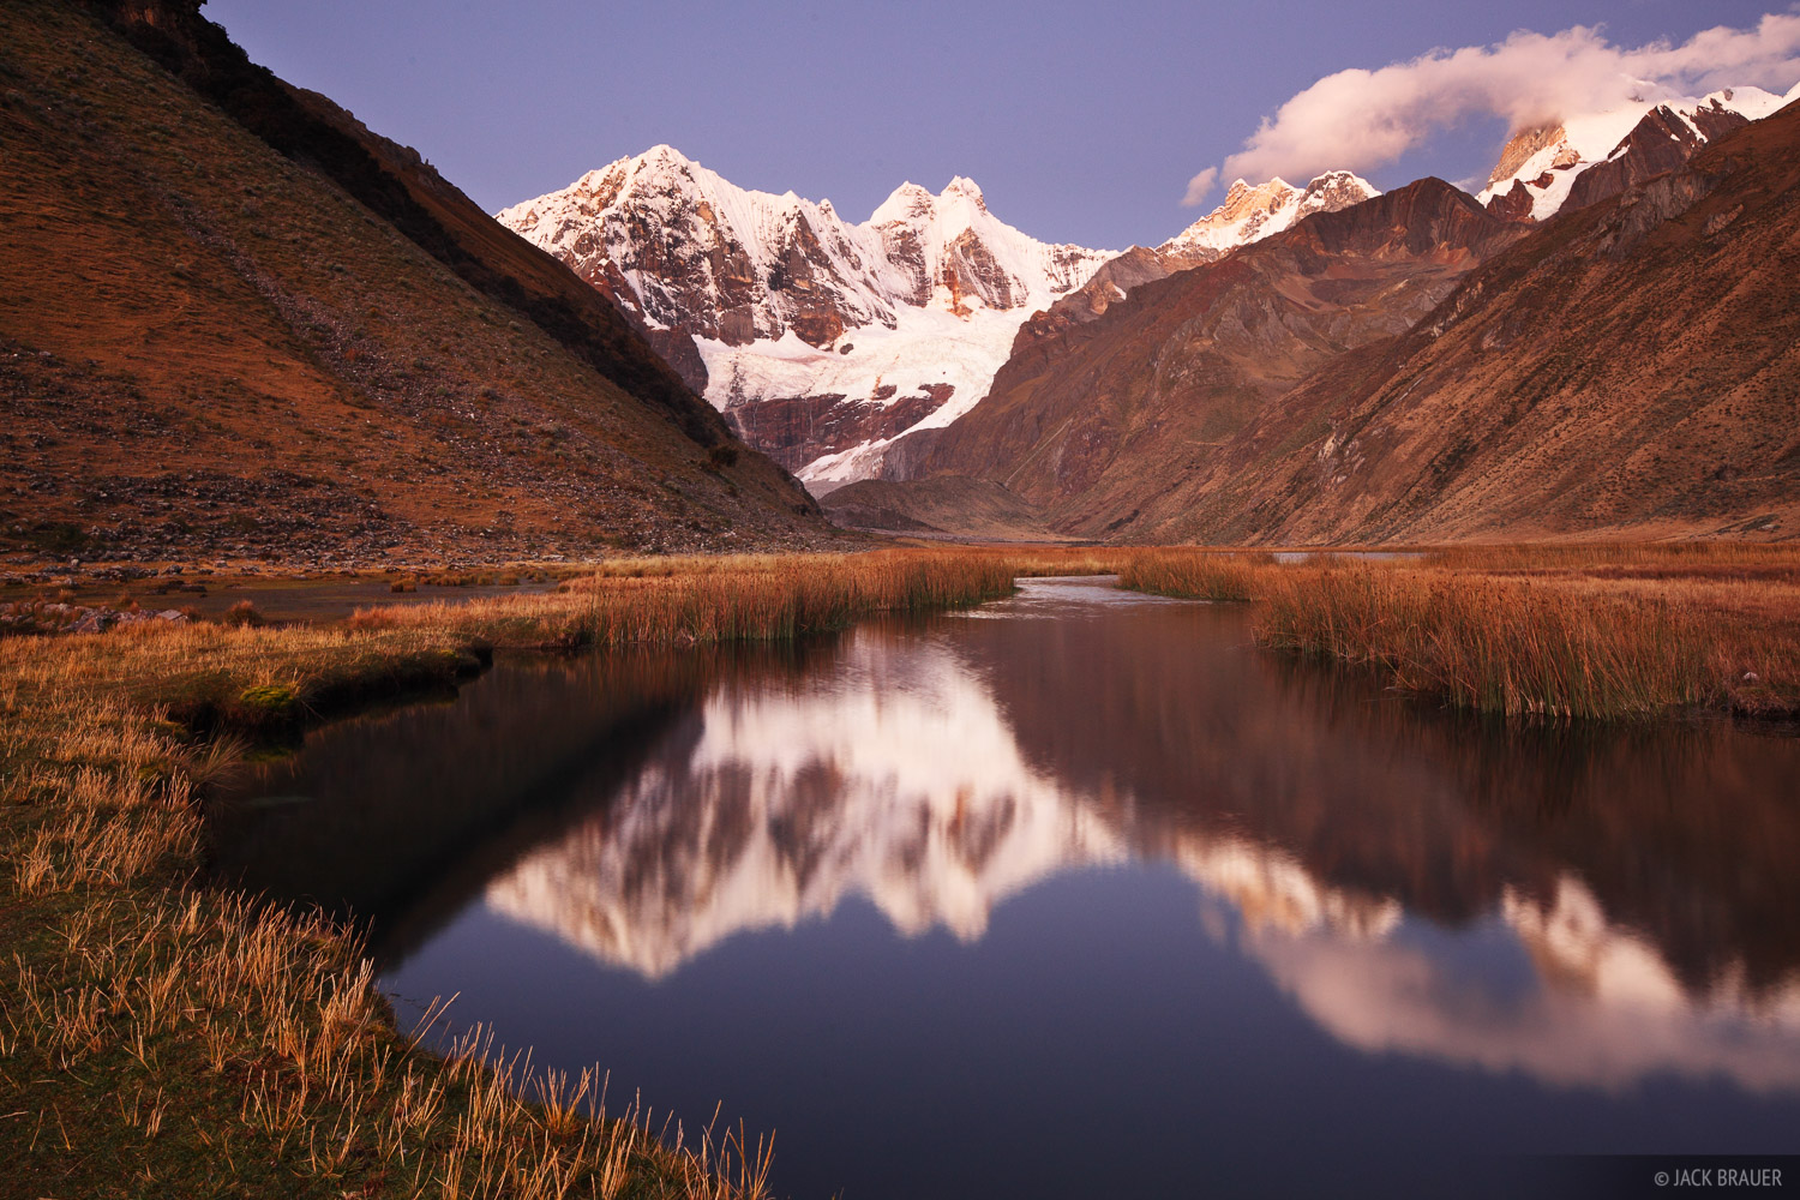 Jirishanca, Cordillera Huayhuash, Peru, Laguna Jahuacocha, reflection, photo